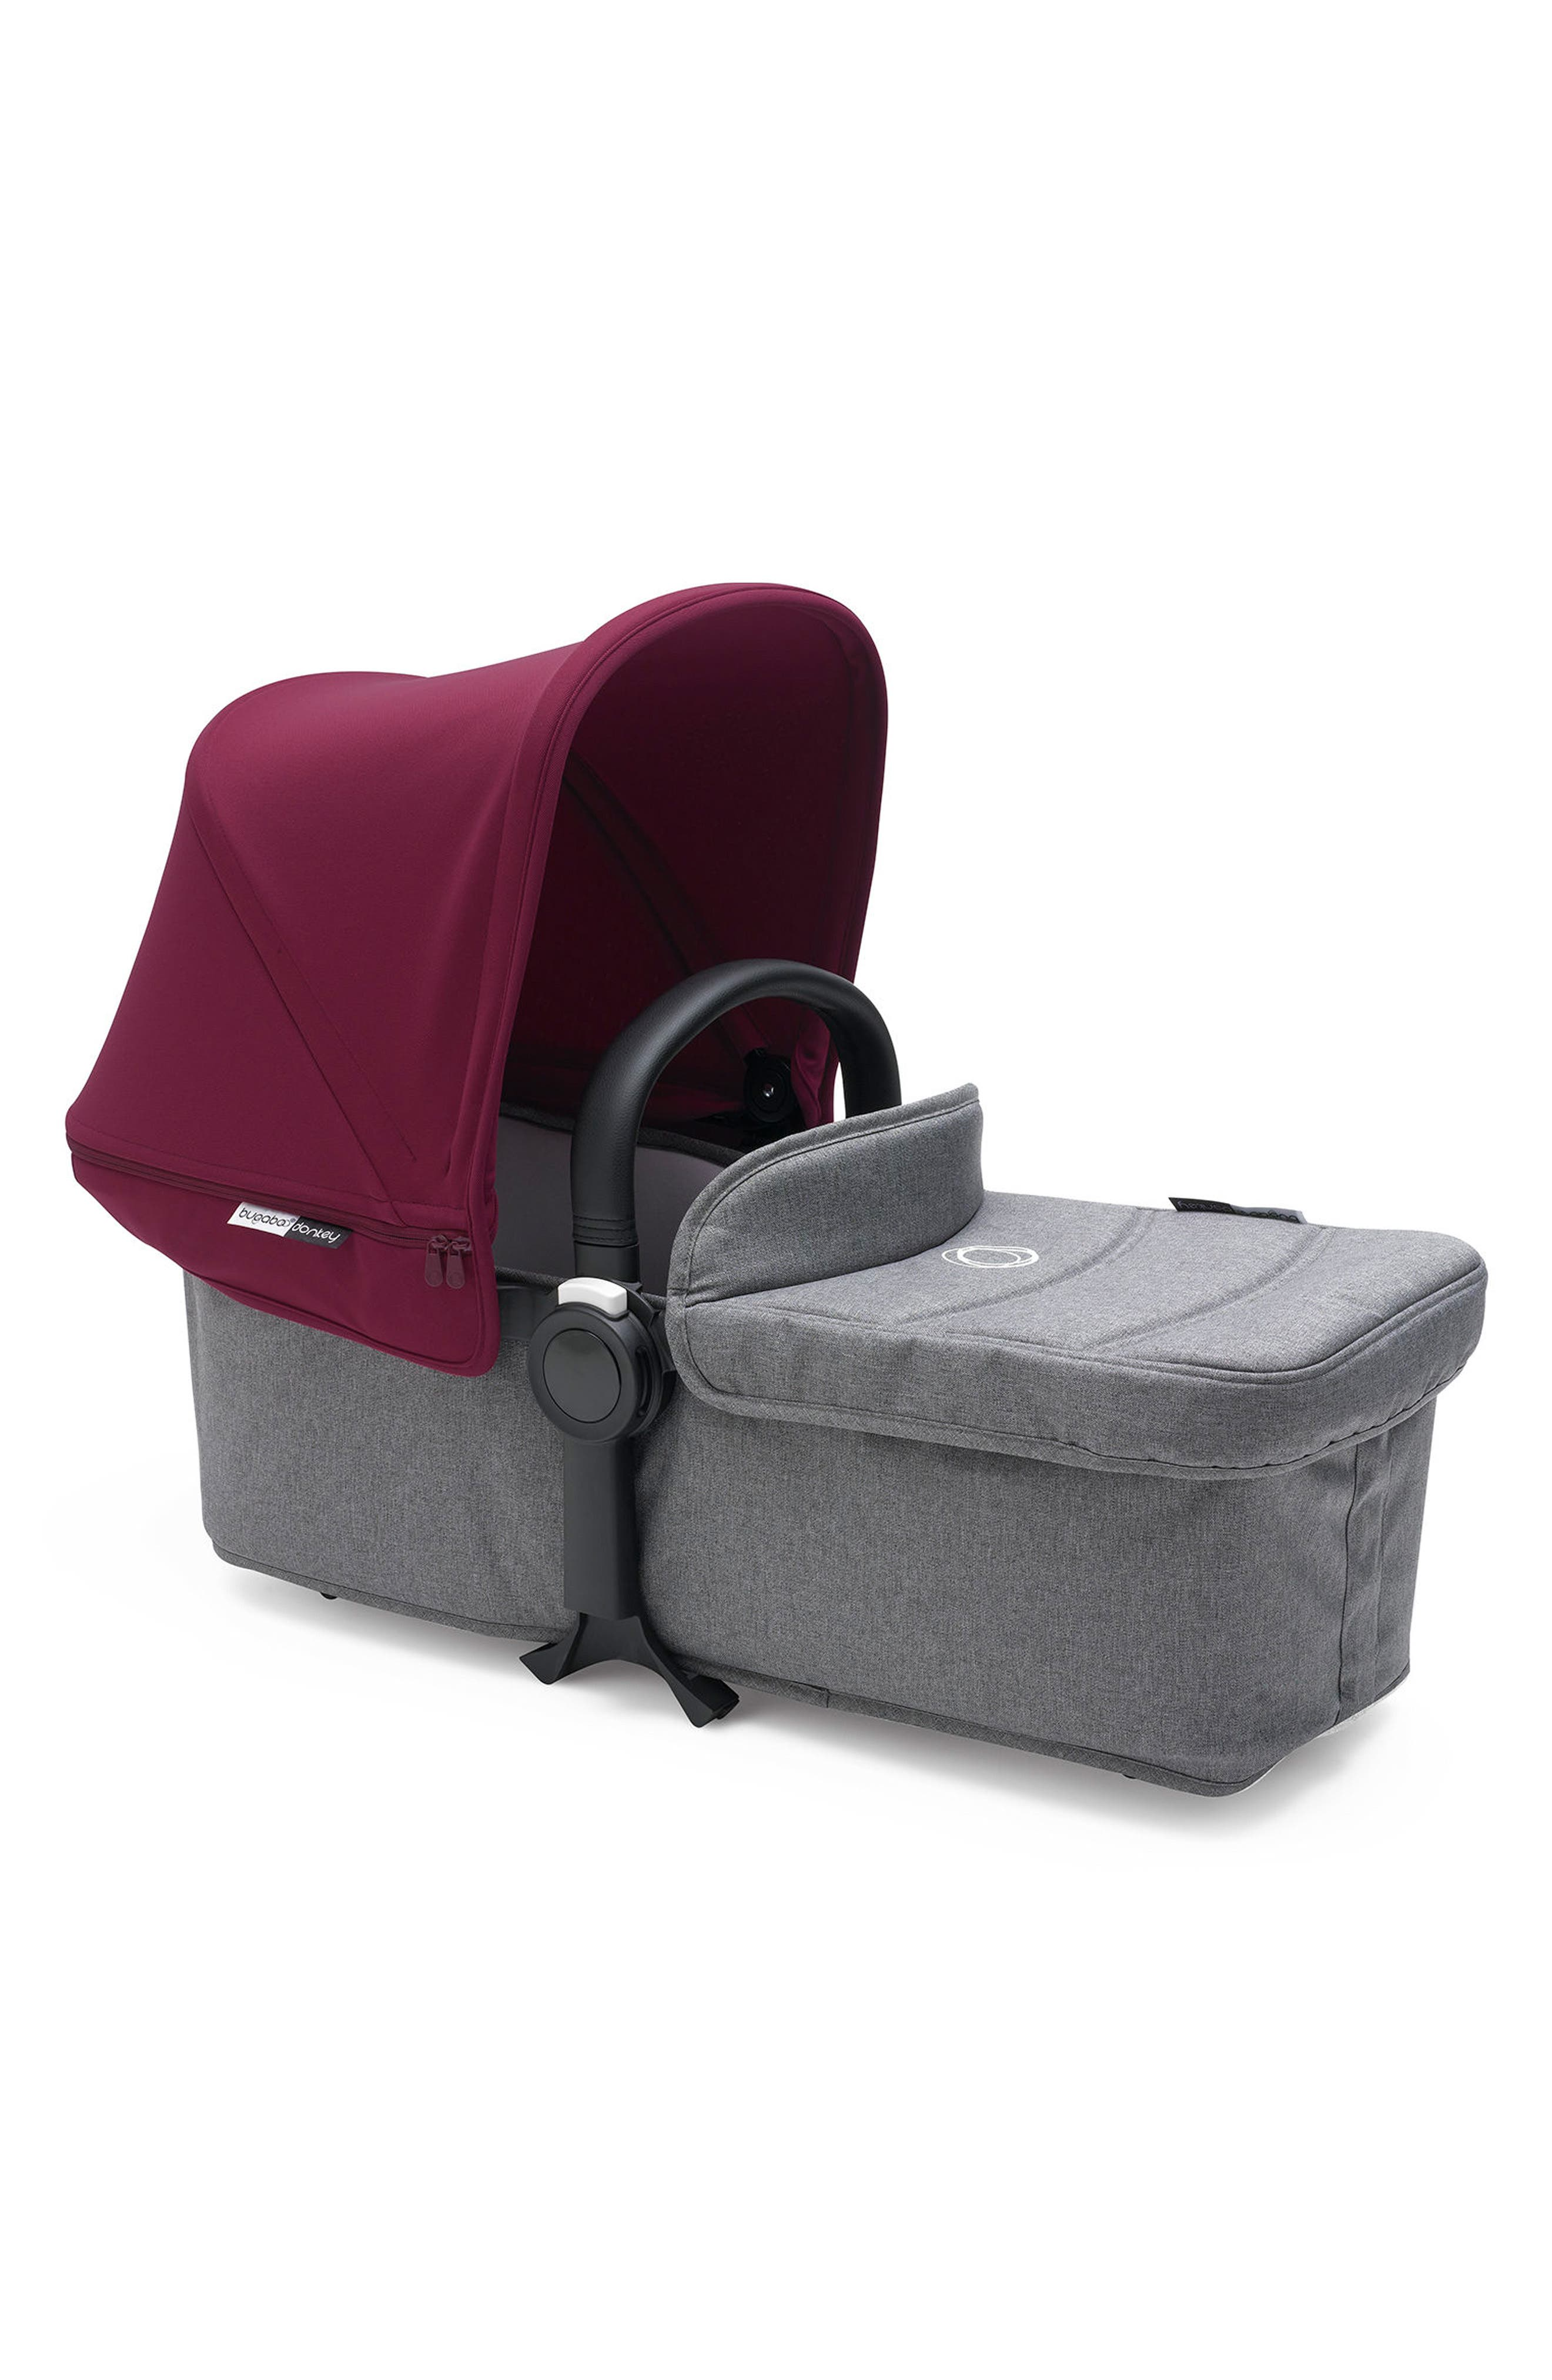 Bugaboo Bassinet Tailored Fabric Set for Donkey2 Stroller